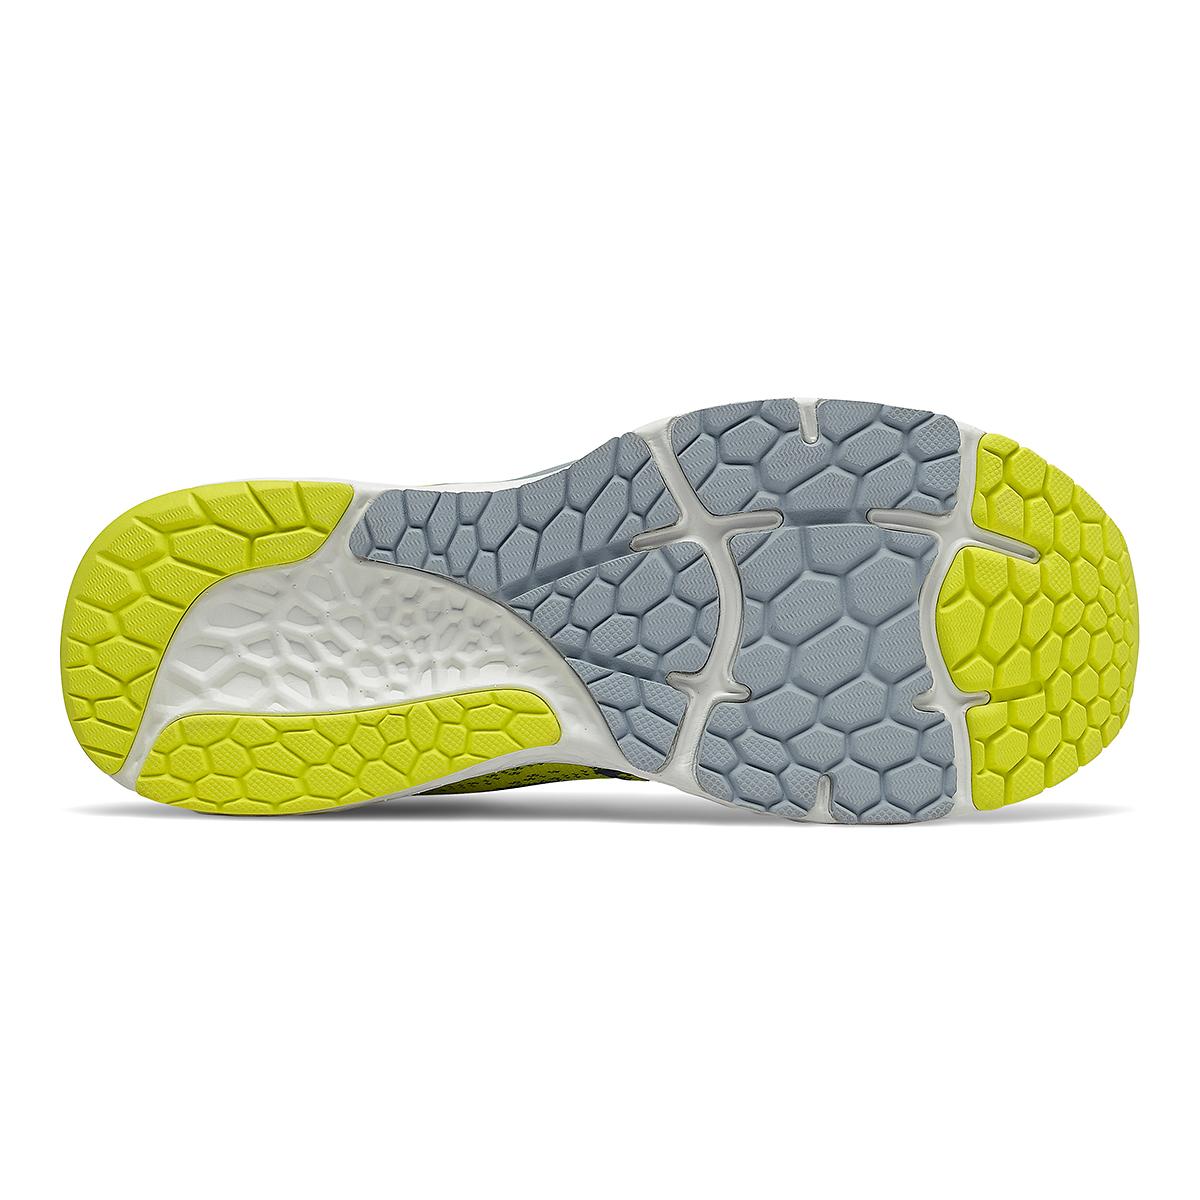 Men's New Balance Fresh Foam 880v11 Running Shoe - Color: Sulphur Yellow/Deep Ocean Grey - Size: 7 - Width: Wide, Sulphur Yellow/Deep Ocean Grey, large, image 5